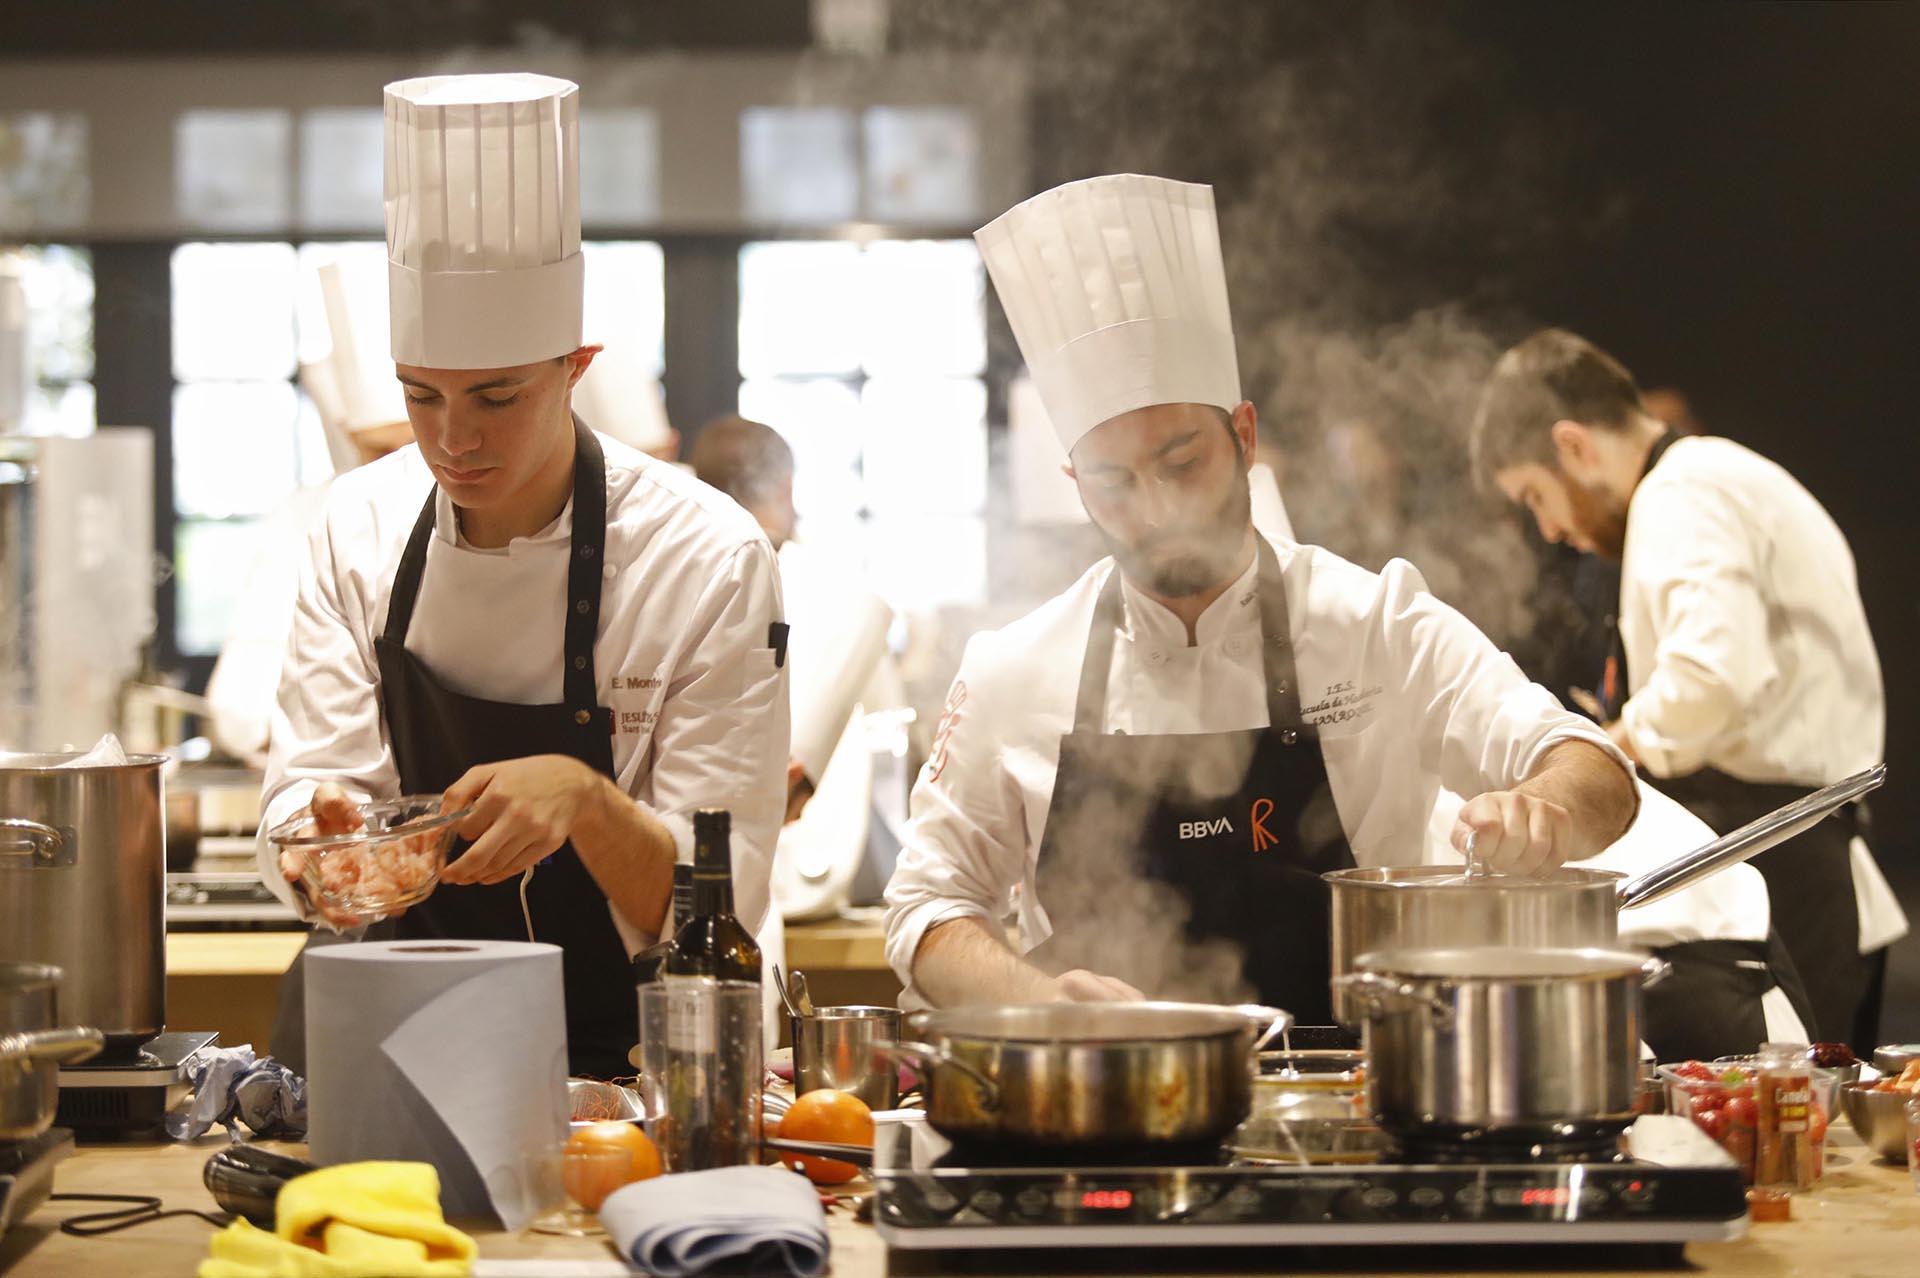 Event awards BBVA hospitality scholarships sustainable kitchen construction